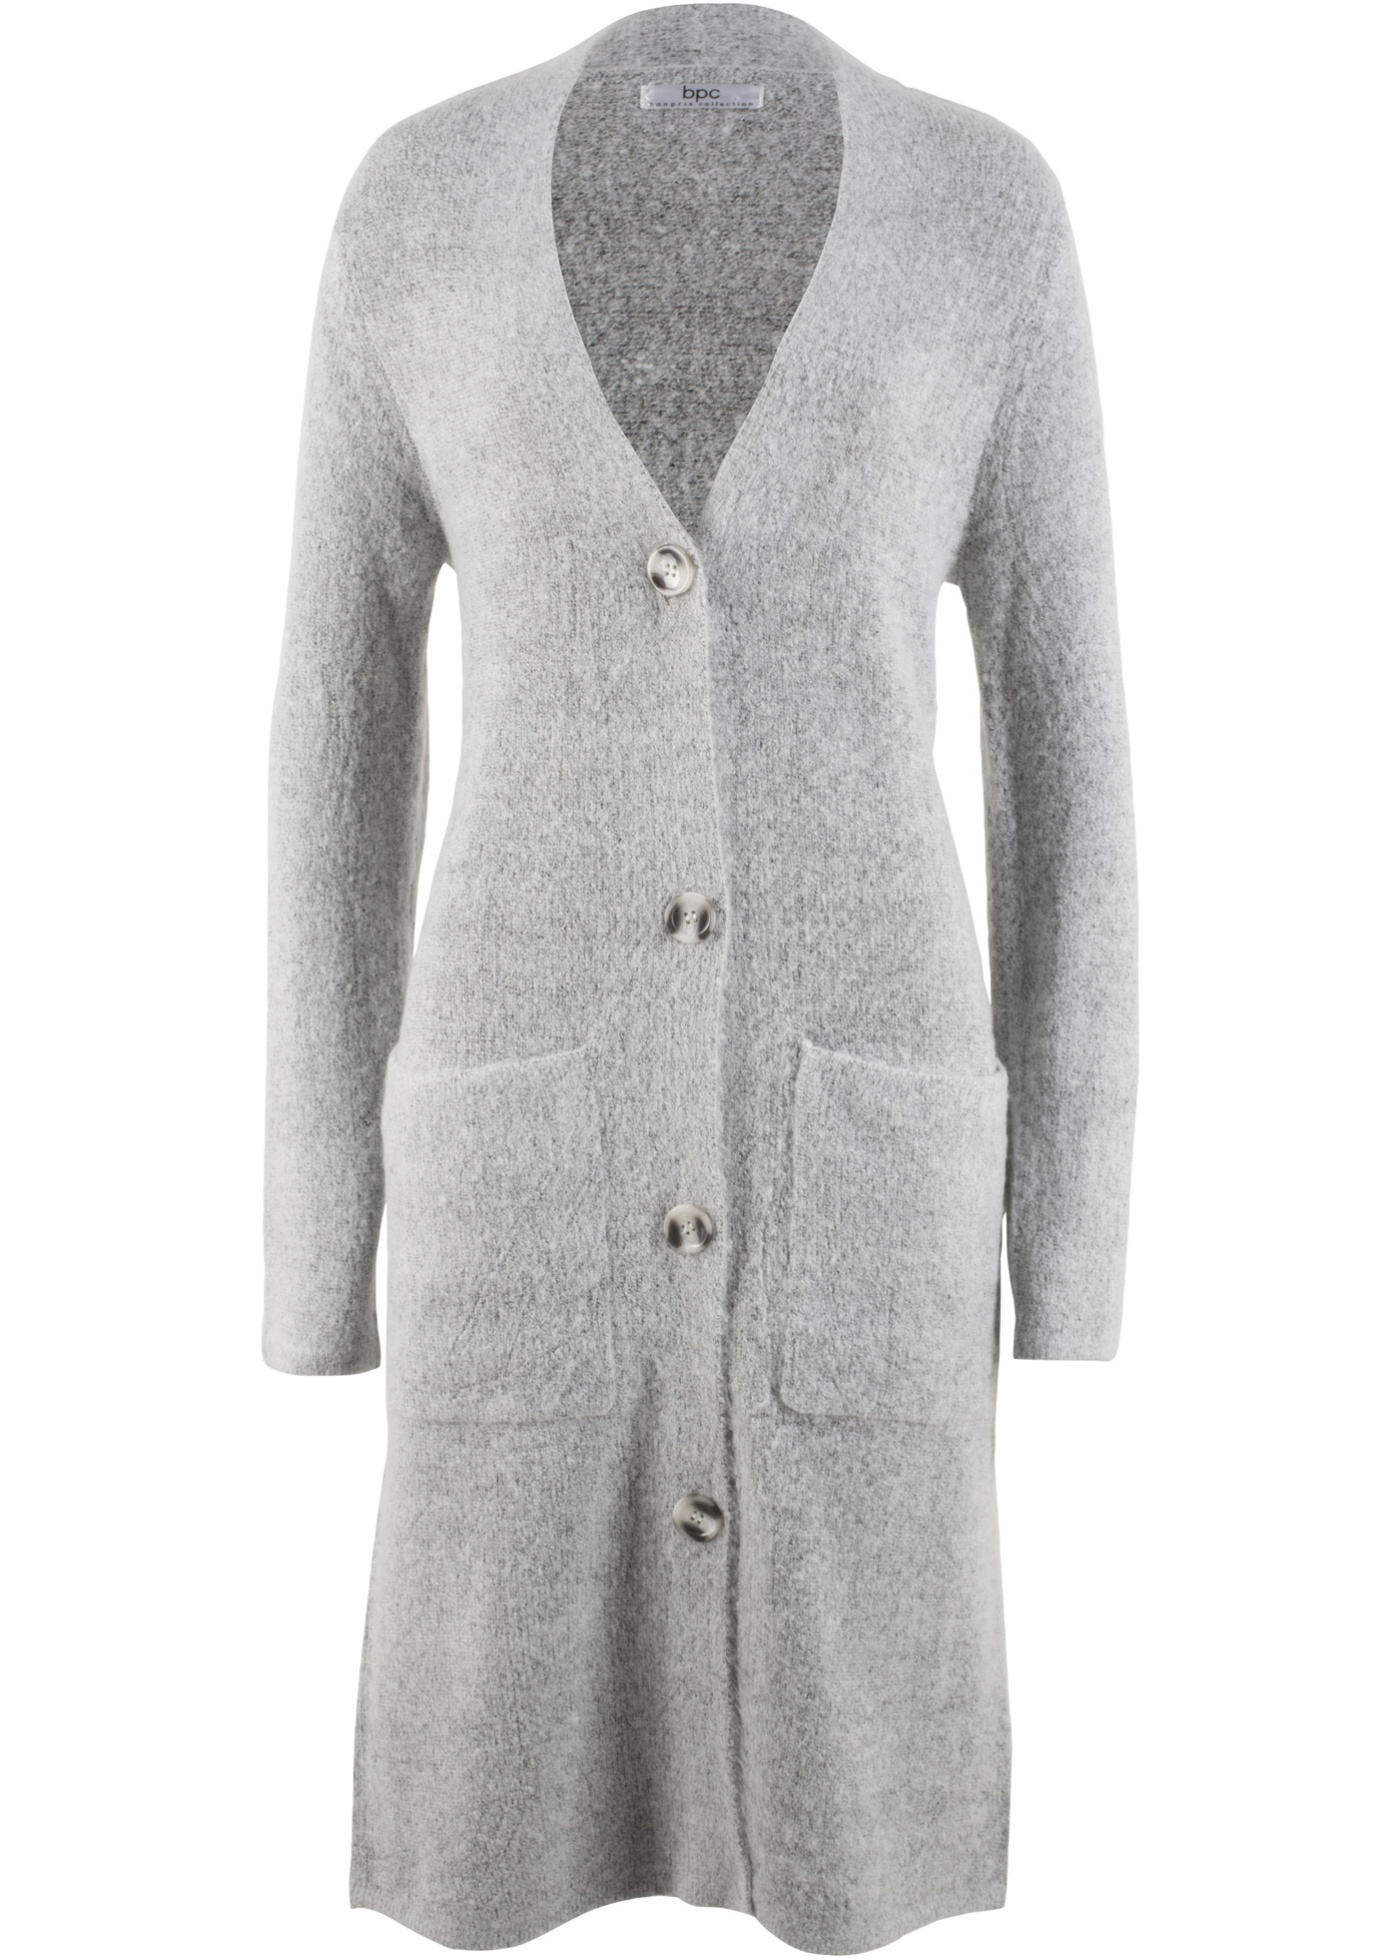 Dlouhý pletený kabátek, dlouhý rukáv - Šedá